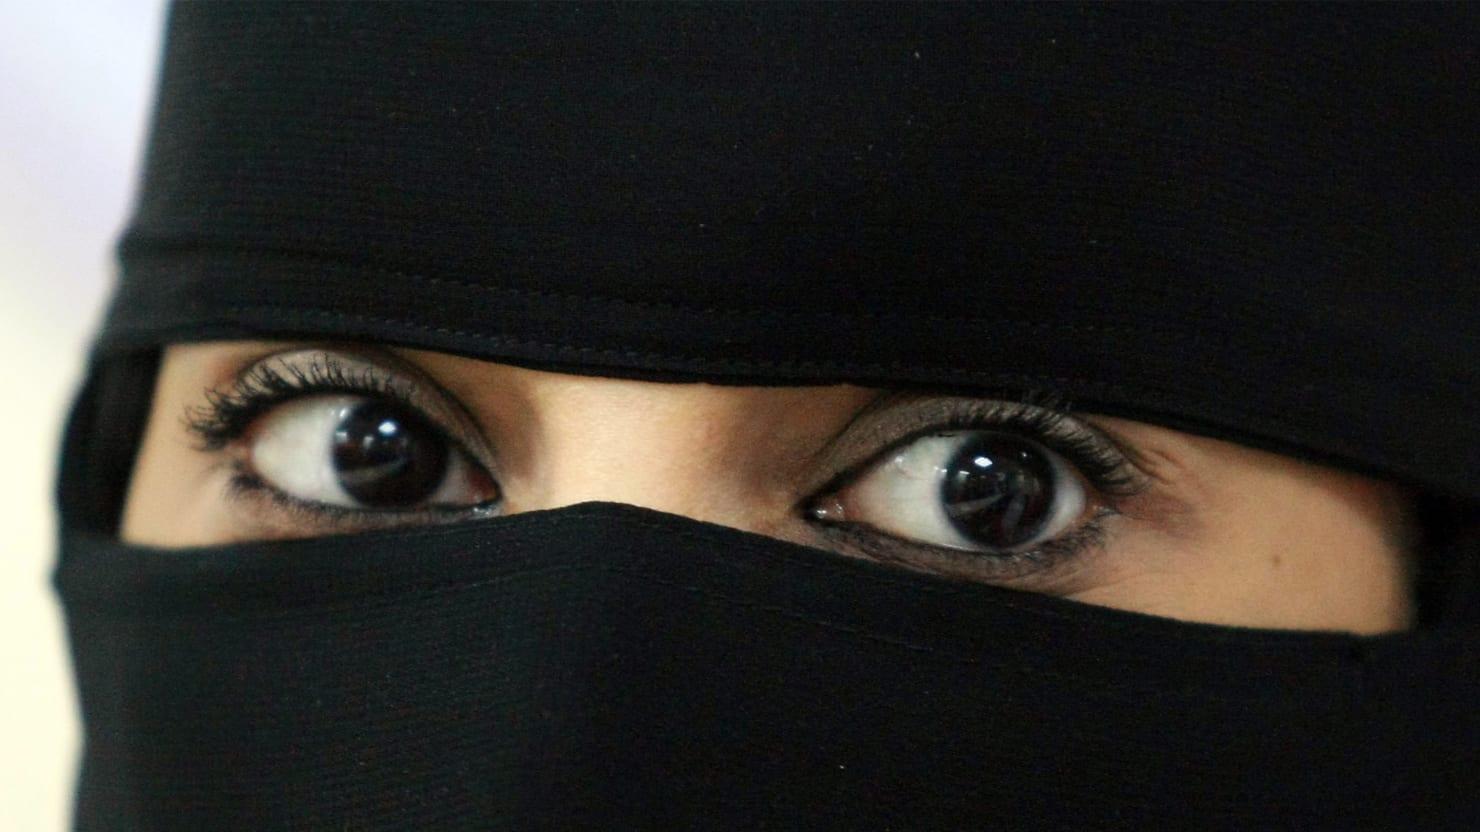 Saudi Activist Manal Al-Sharif on Why She Removed the Veil